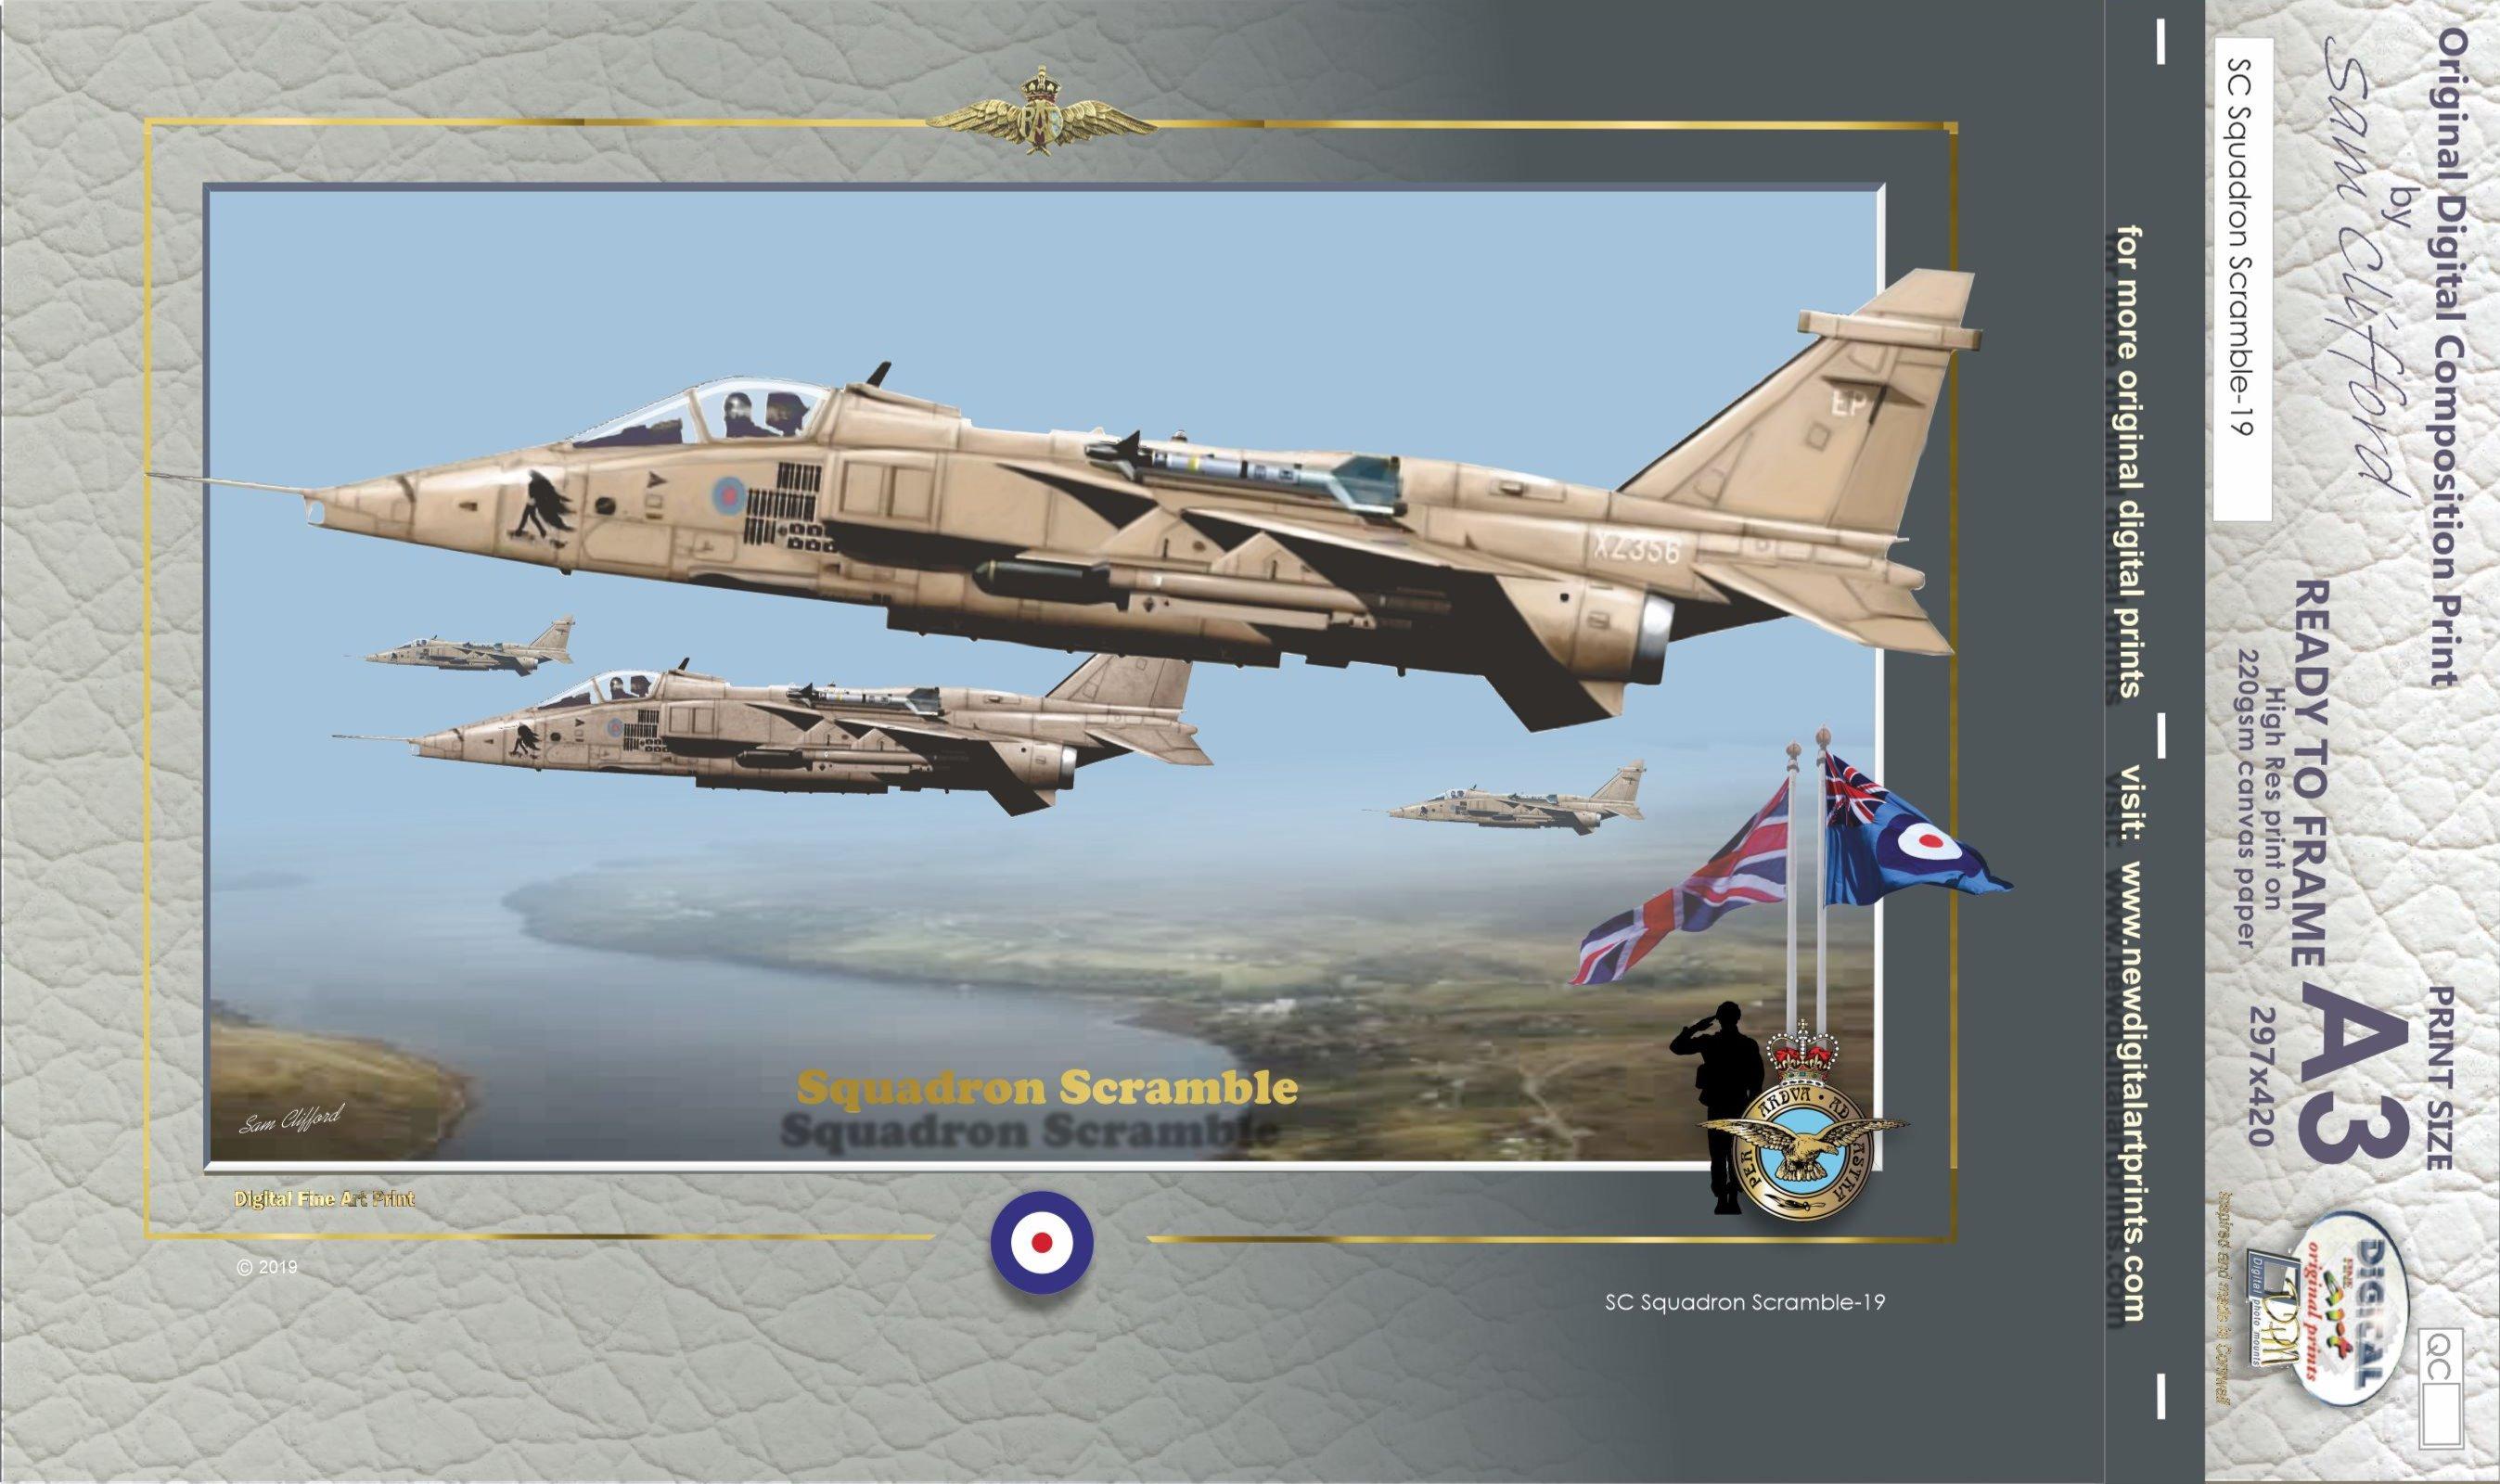 print code: Squadron Scramble-19